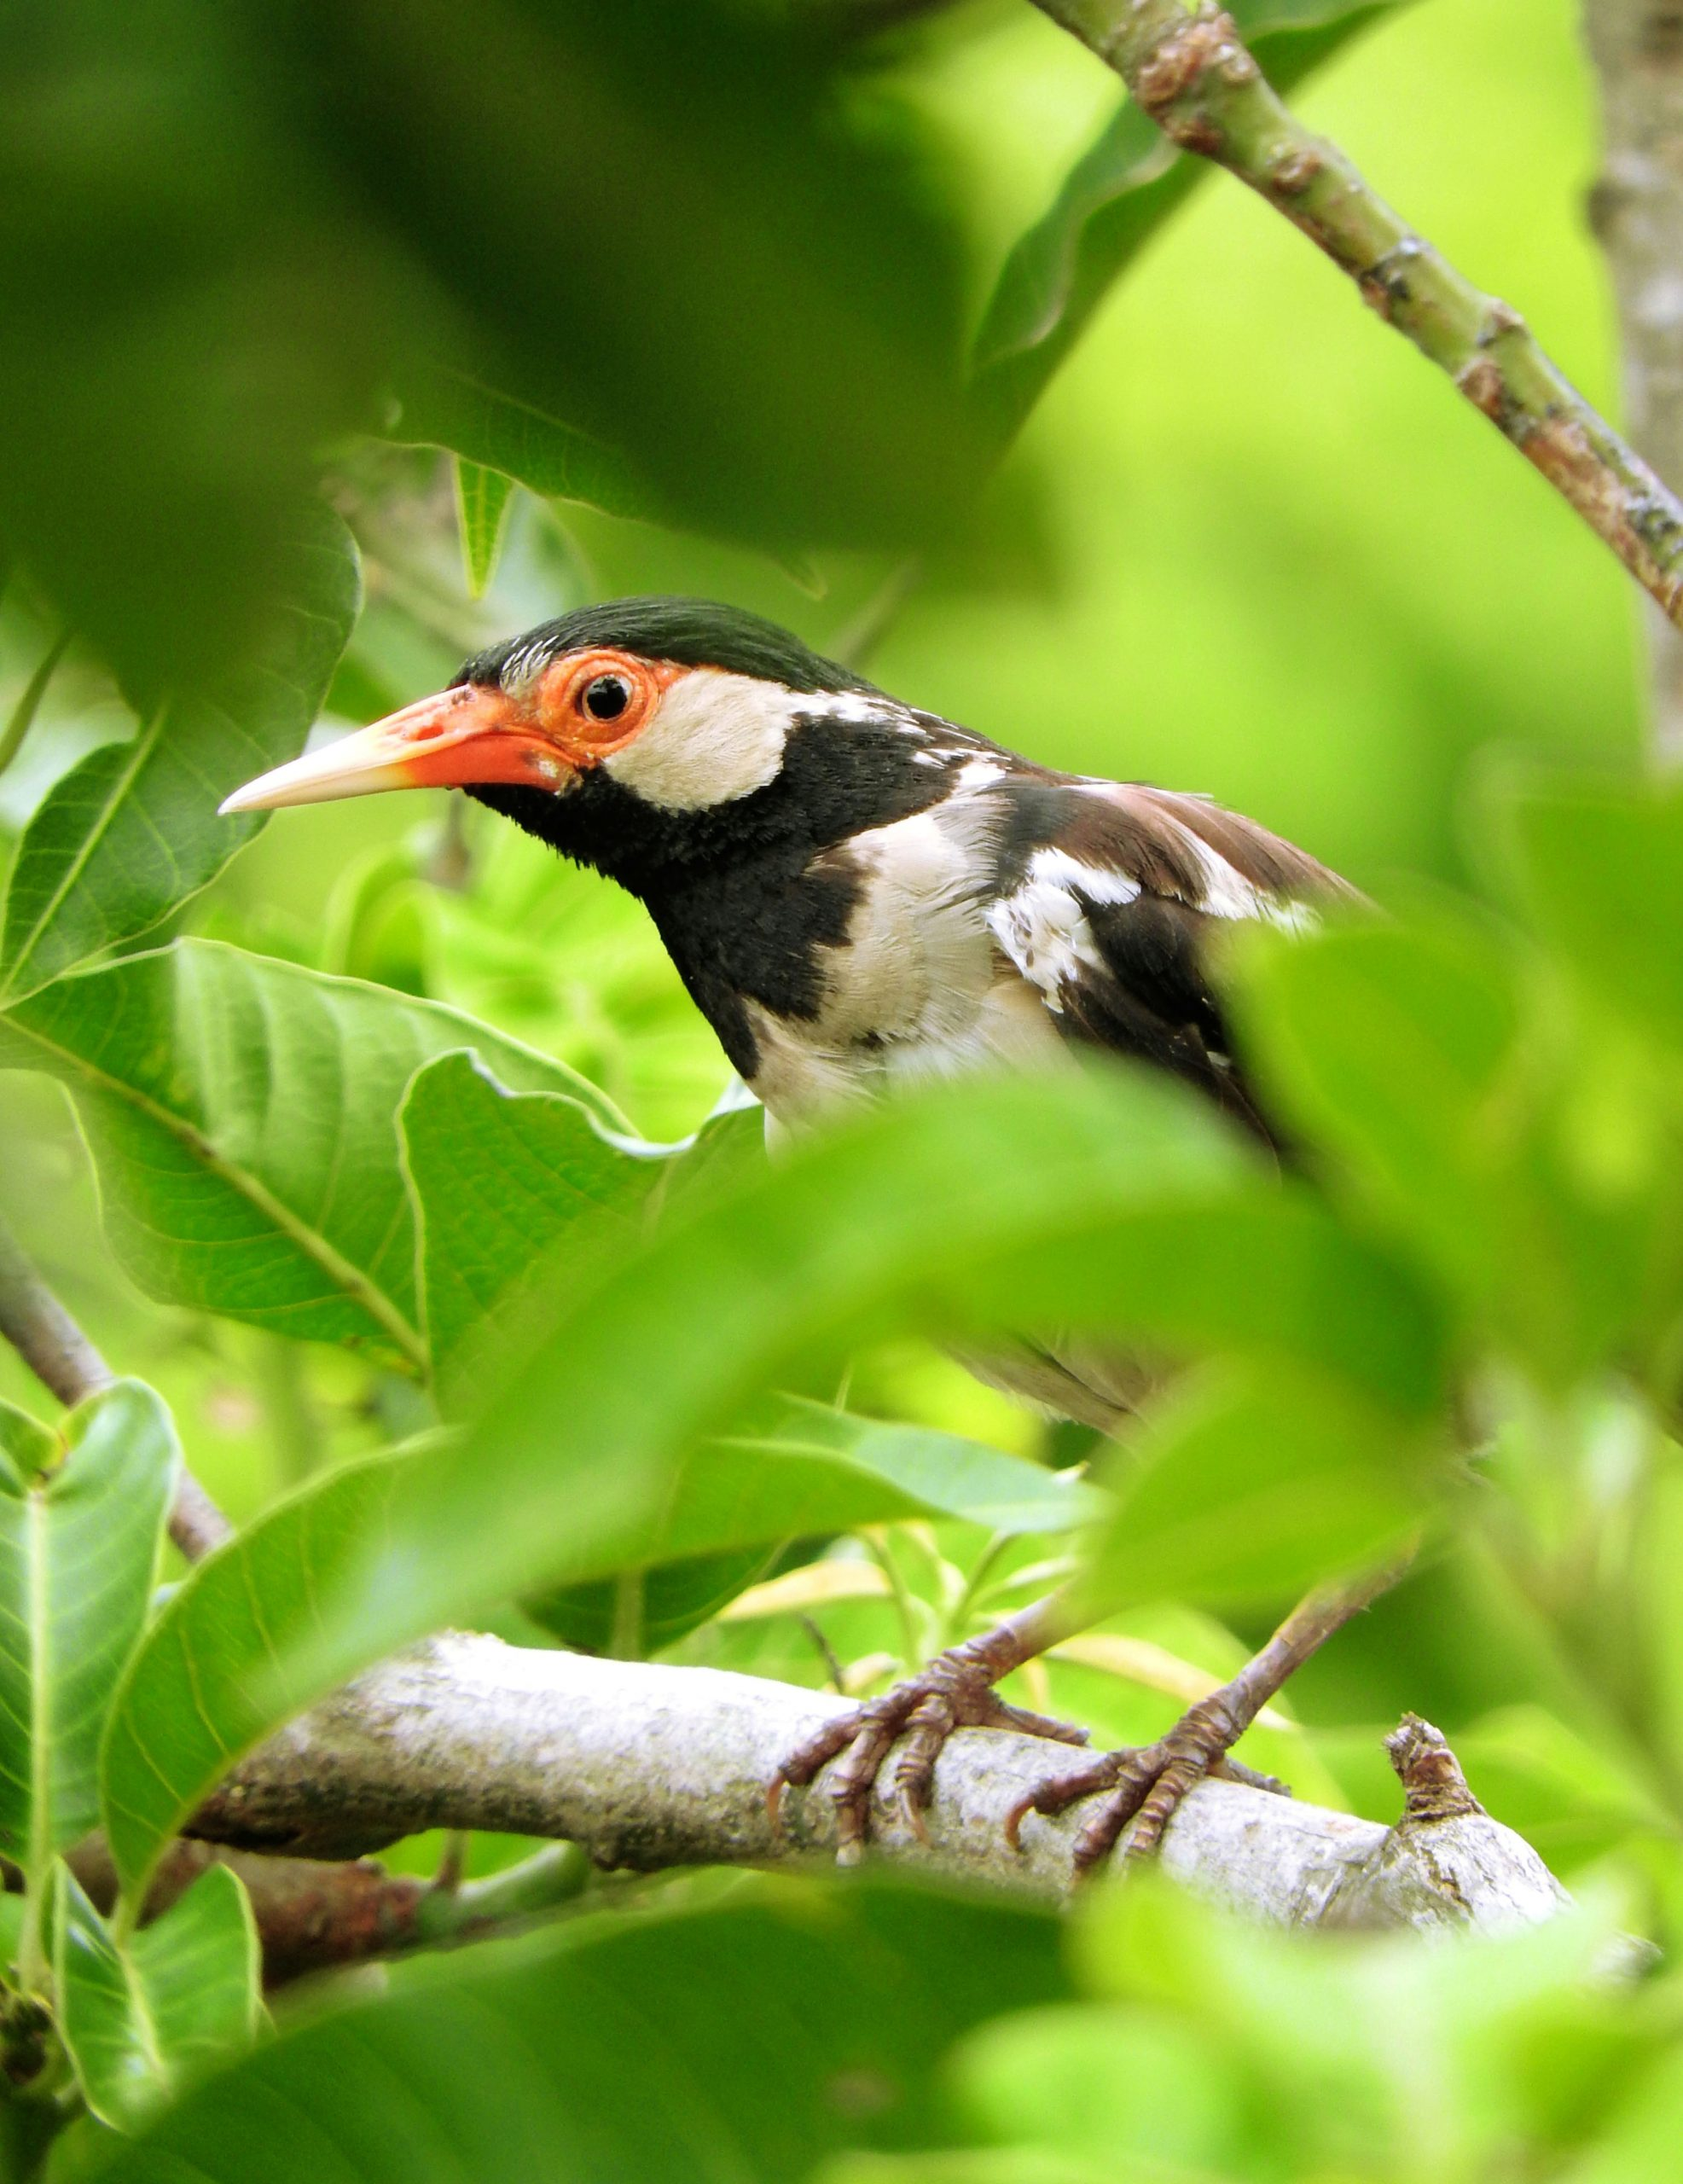 Pied Starling bird sitting on a branch